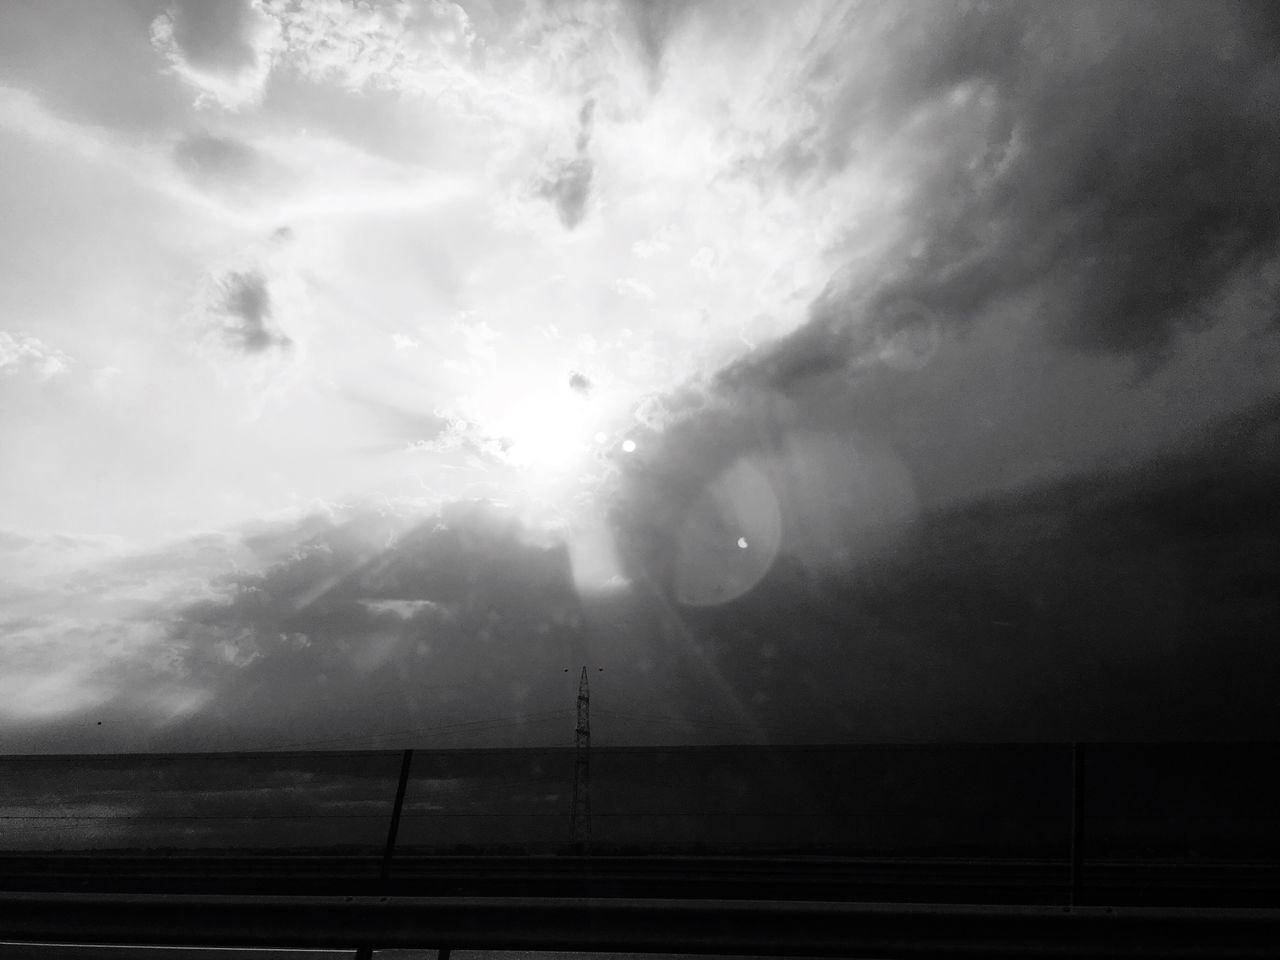 Sky Sunbeam Motorway Drive Storm